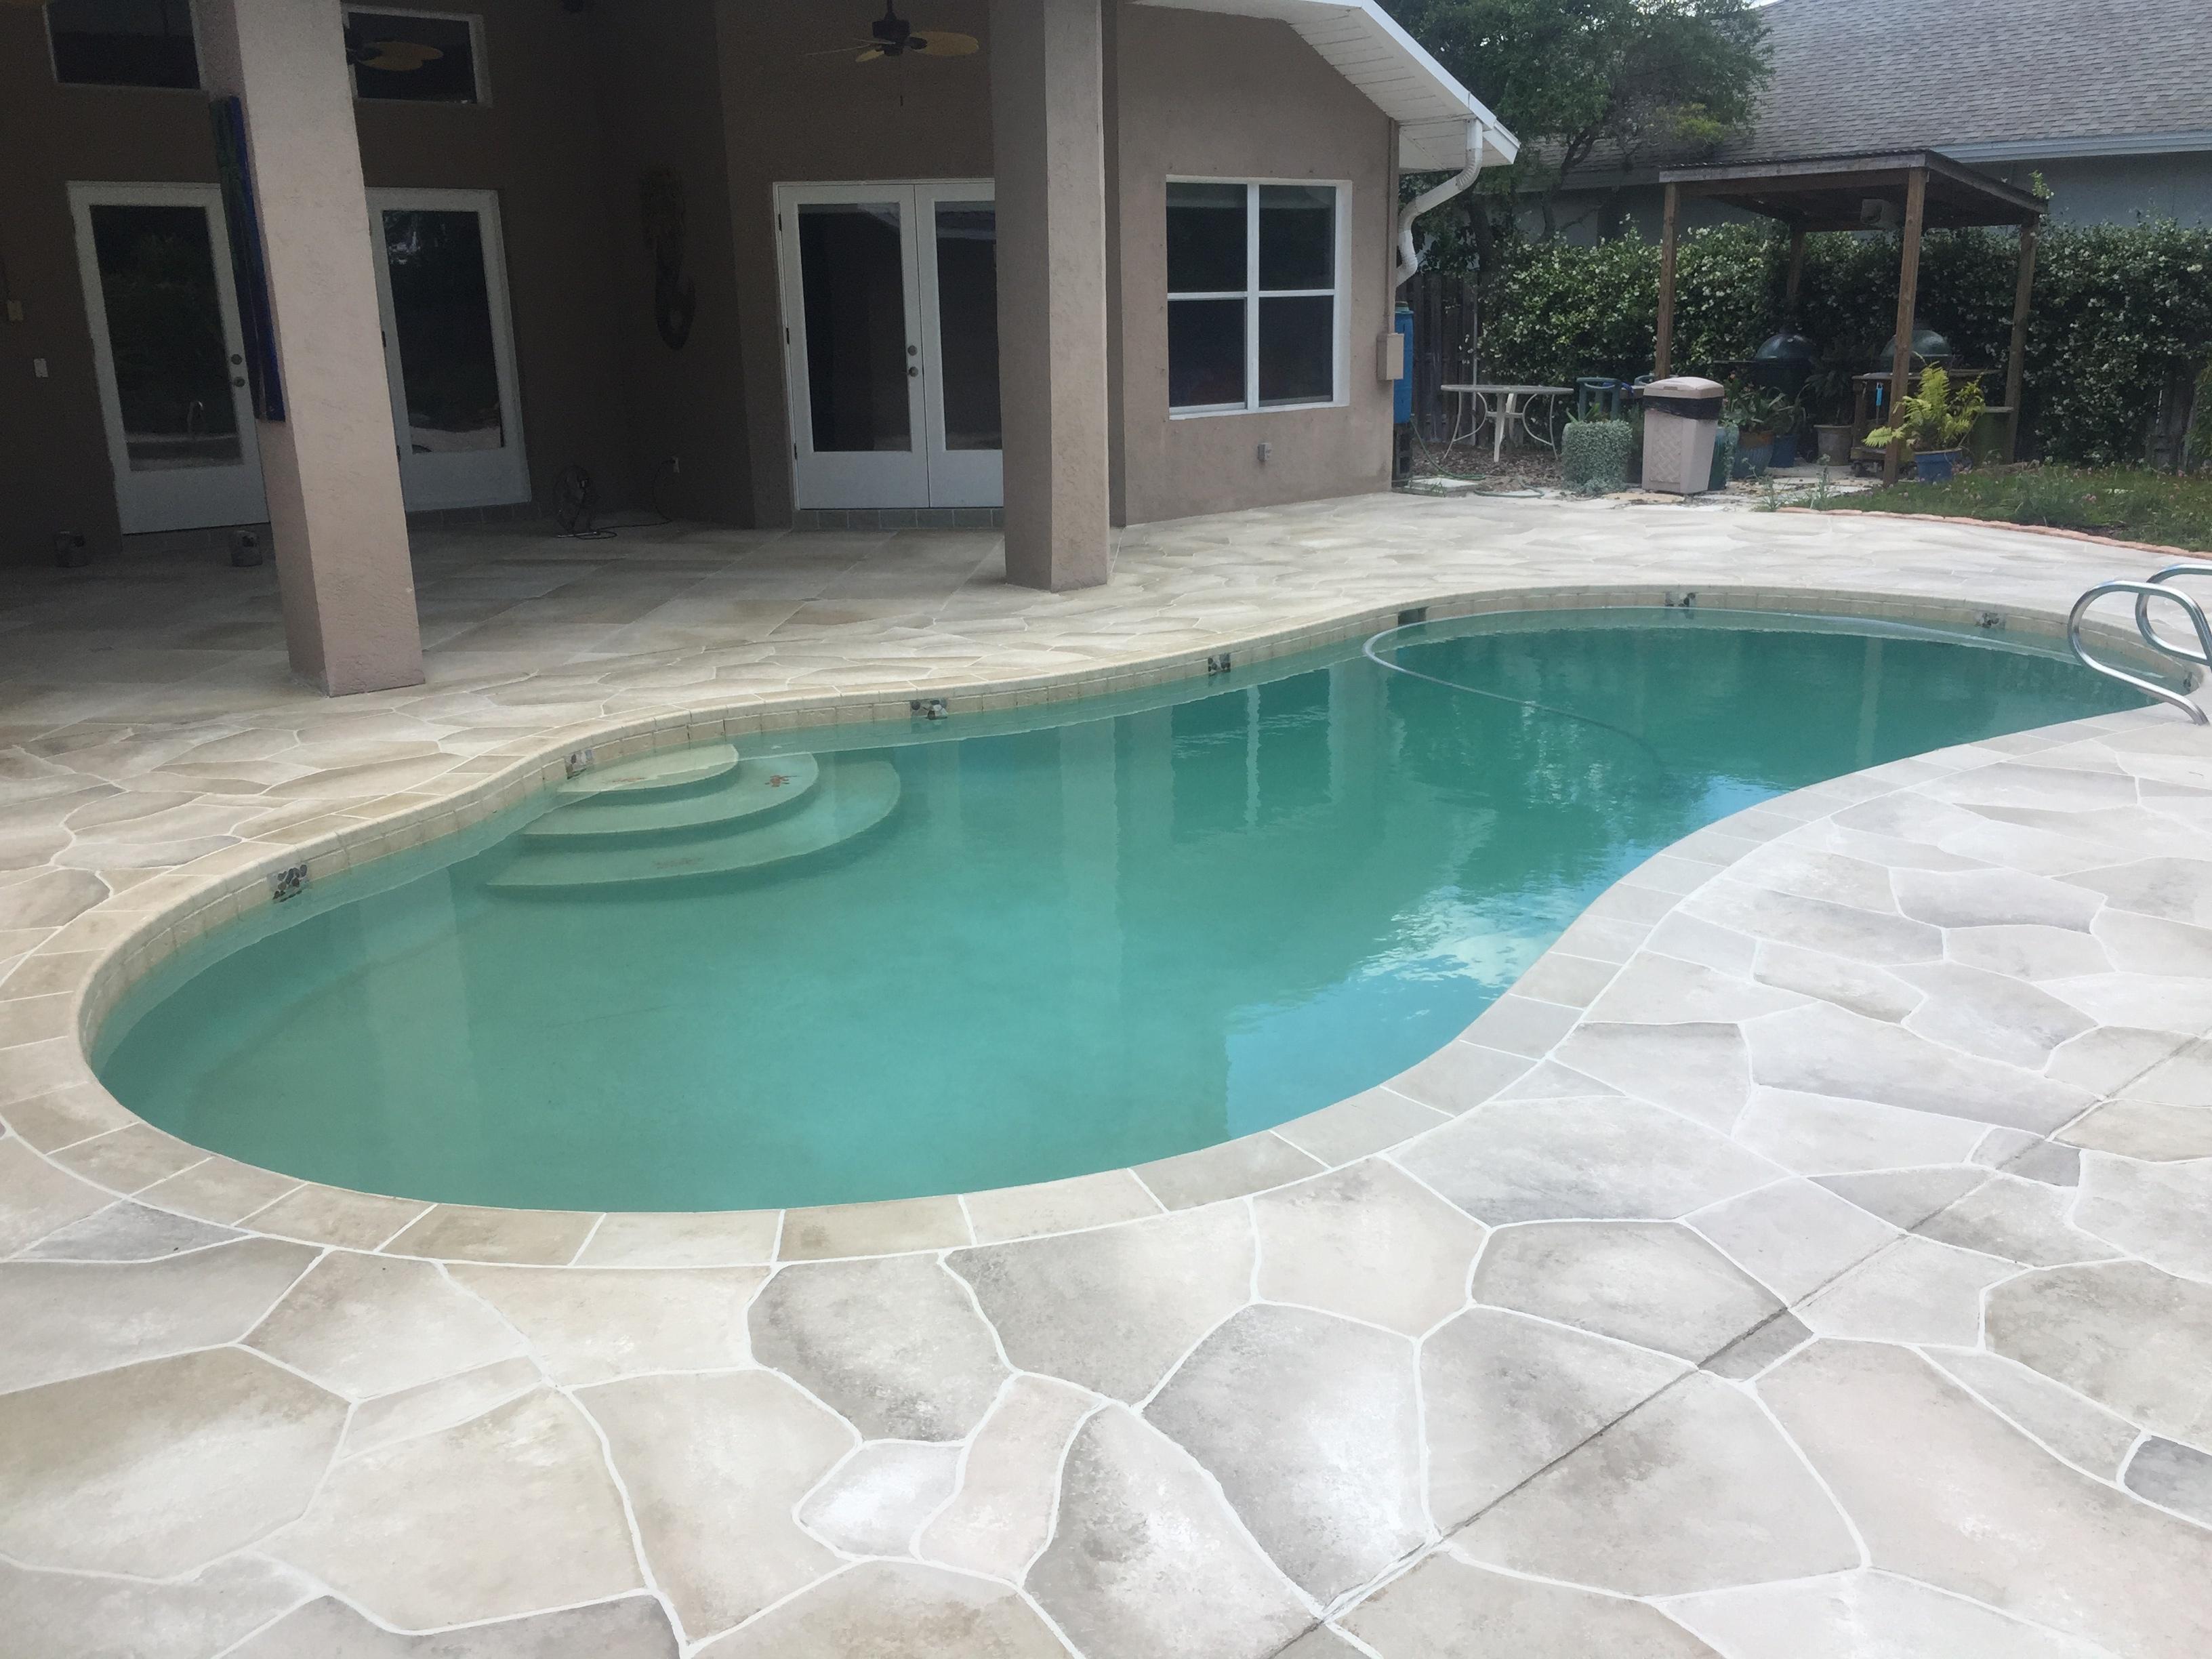 Concrete Designs Florida | decorative pool deck florida on Patio Ideas Around Pool id=36039